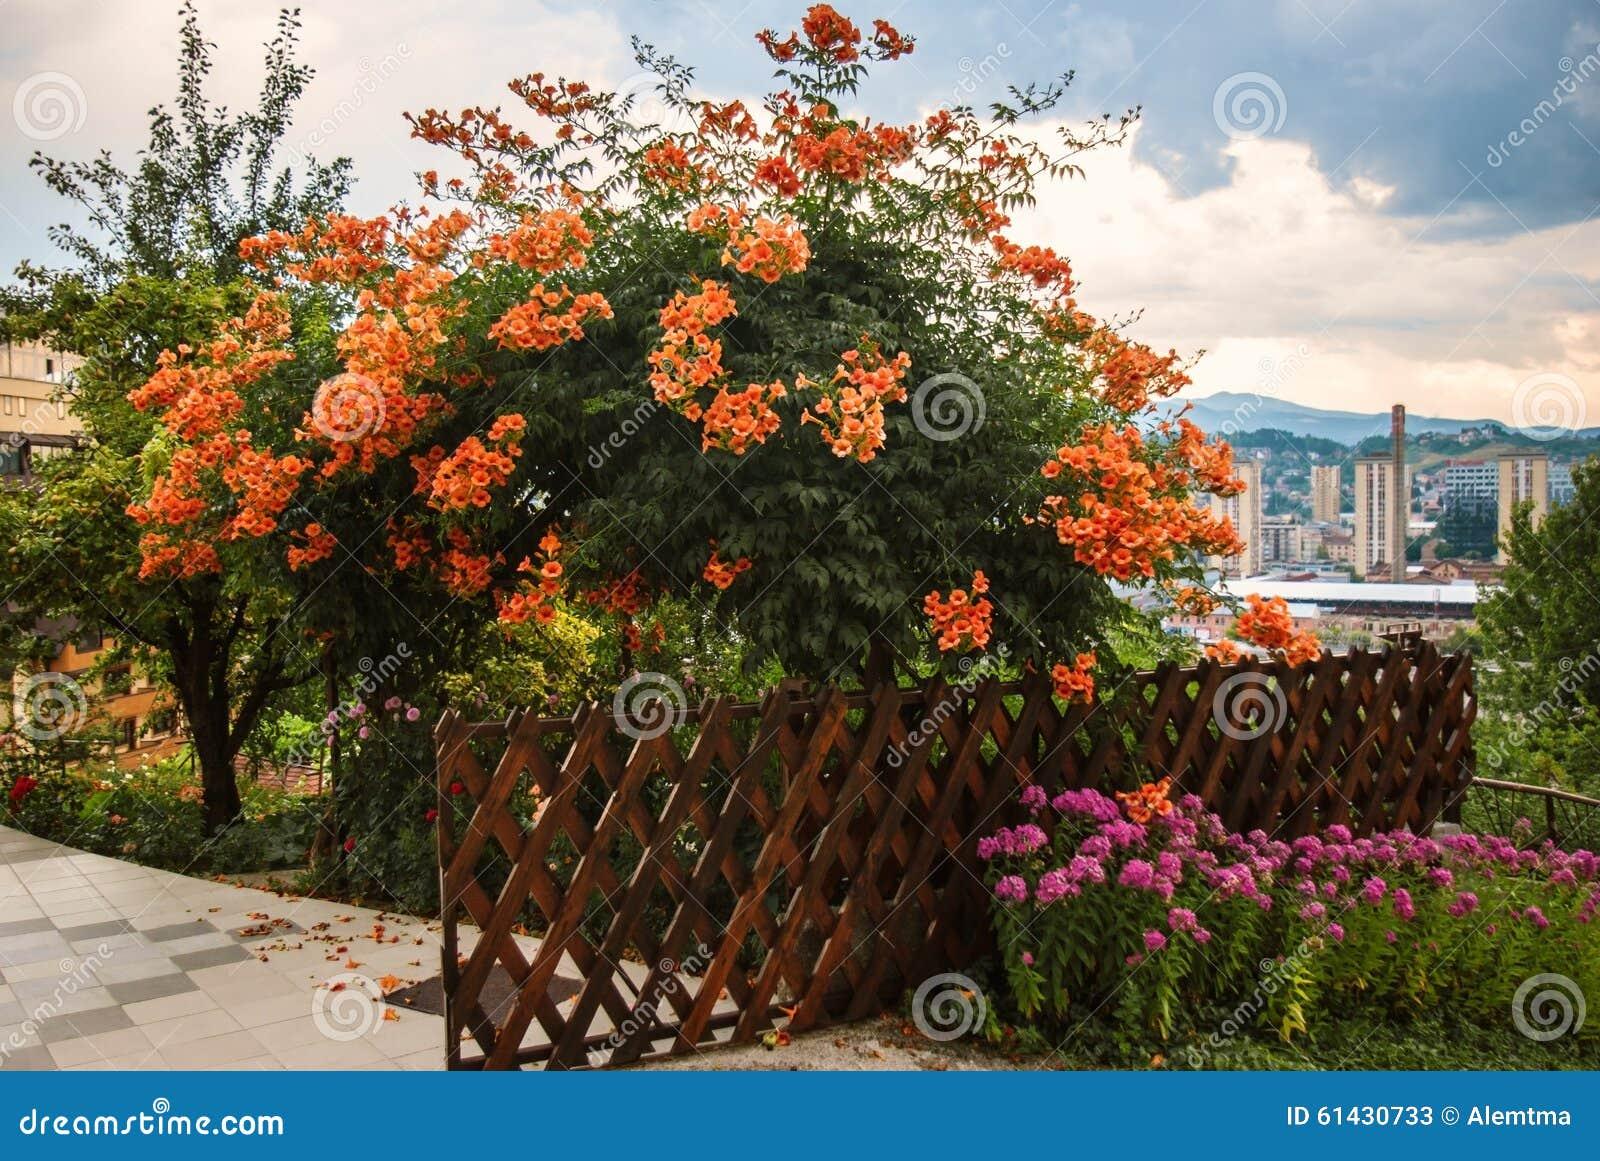 Backyard Summer Background :  images of ` Beautiful colorful flower bush backyard urban background